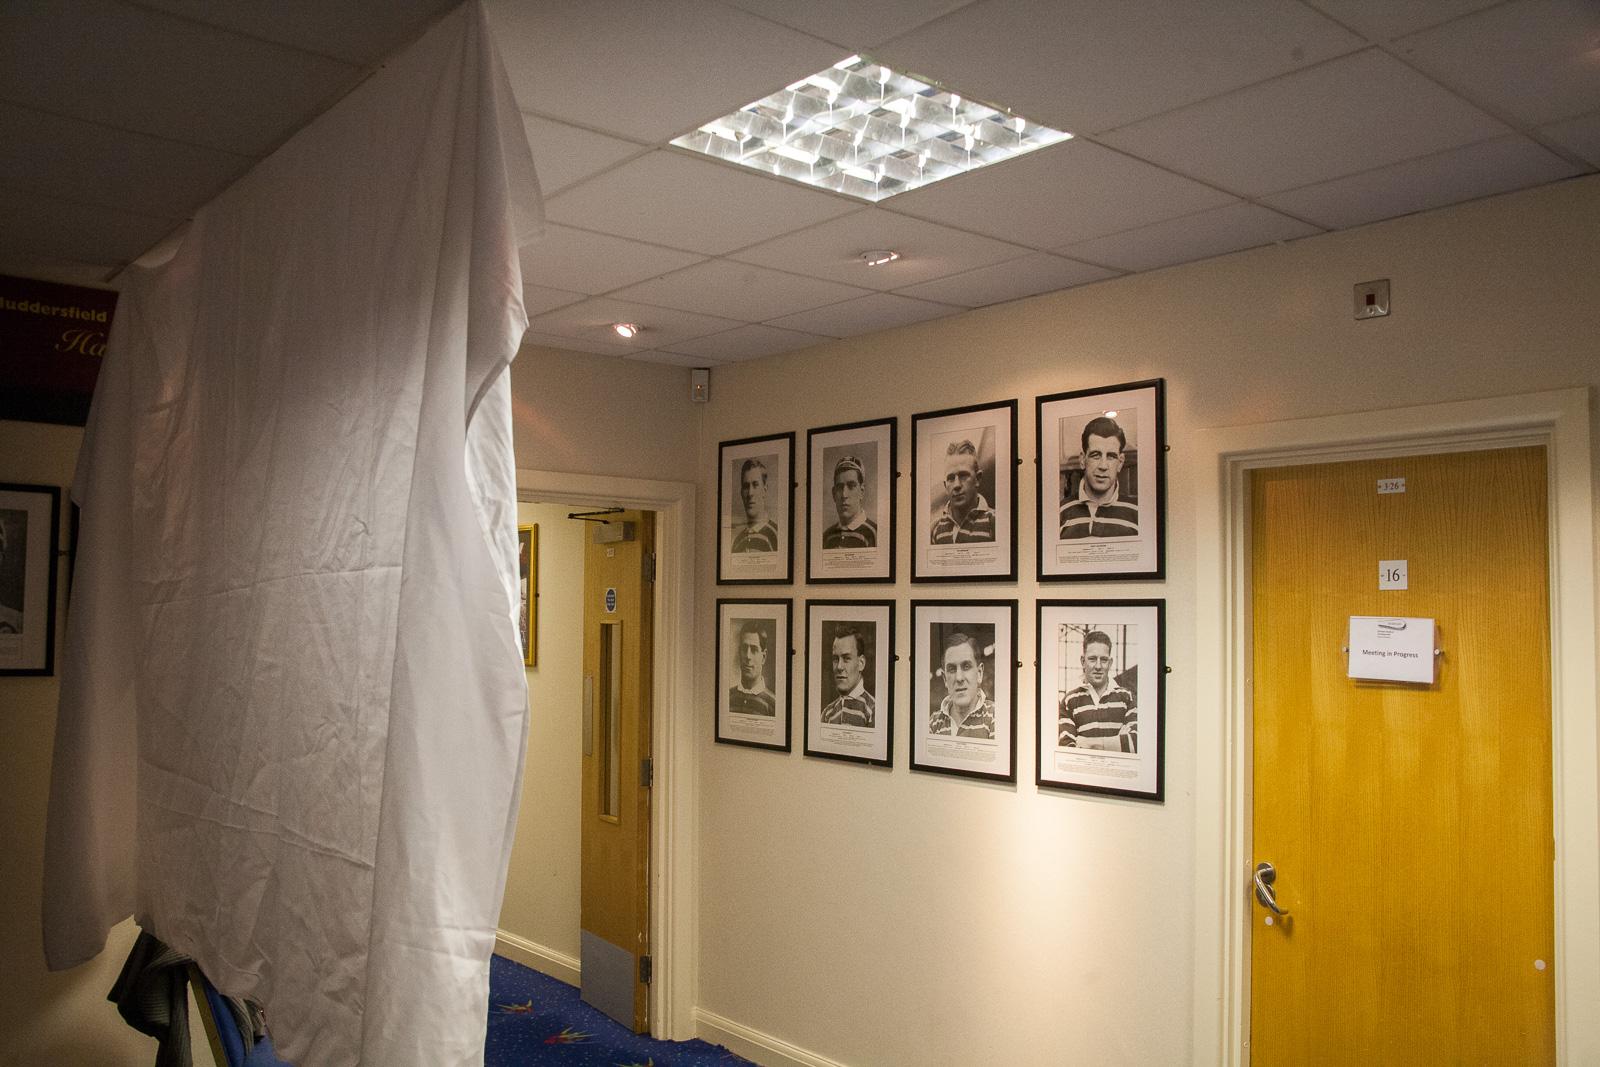 Hall_Of_Fame_Corridor_004.jpg